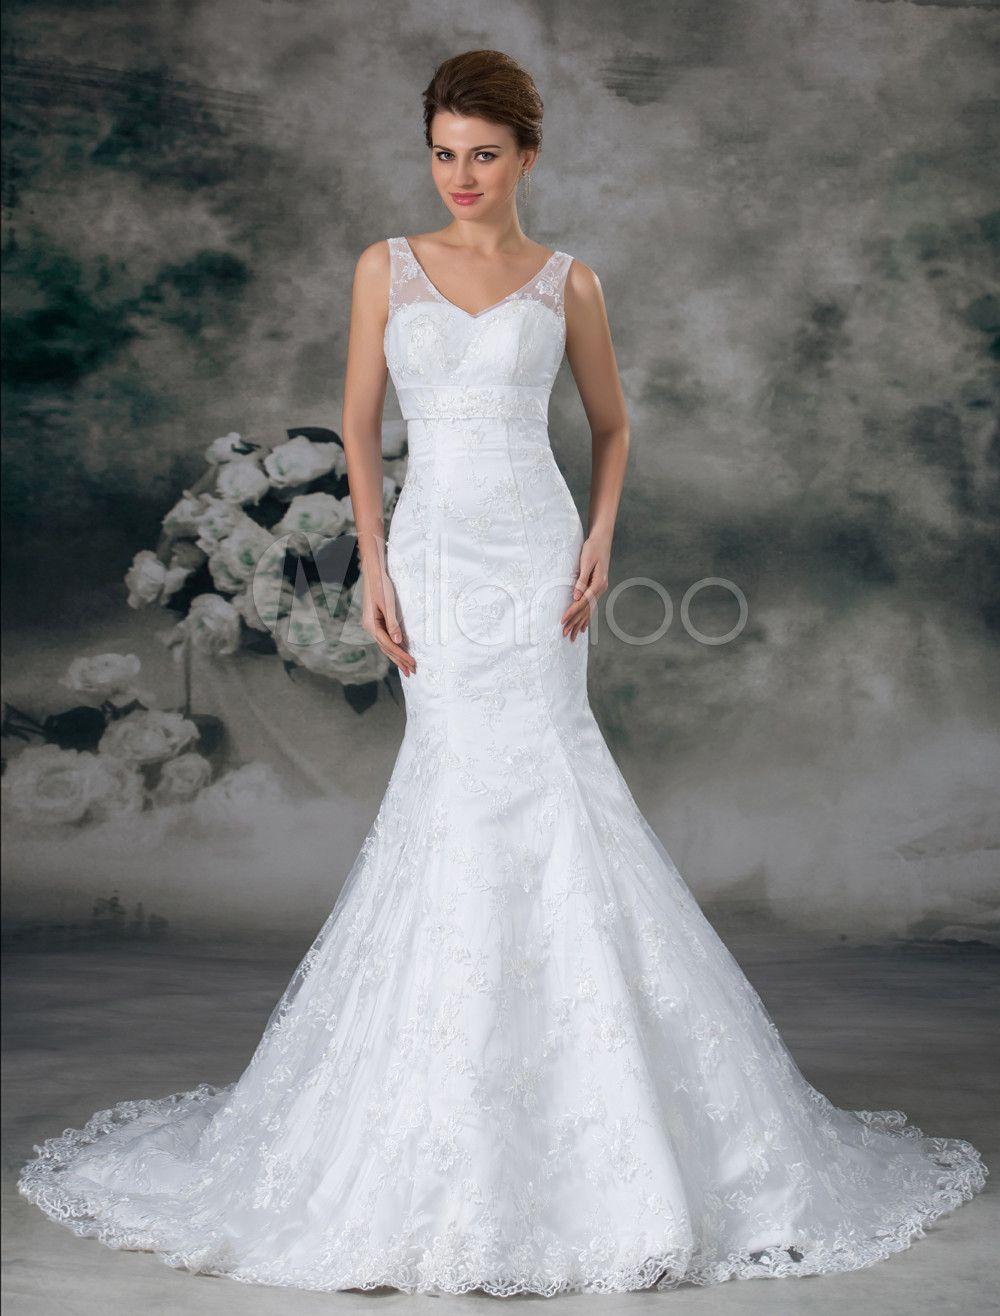 Long lace wedding dress  Milanoo Ltd Wedding Dresses White Mermaid OffTheShoulder